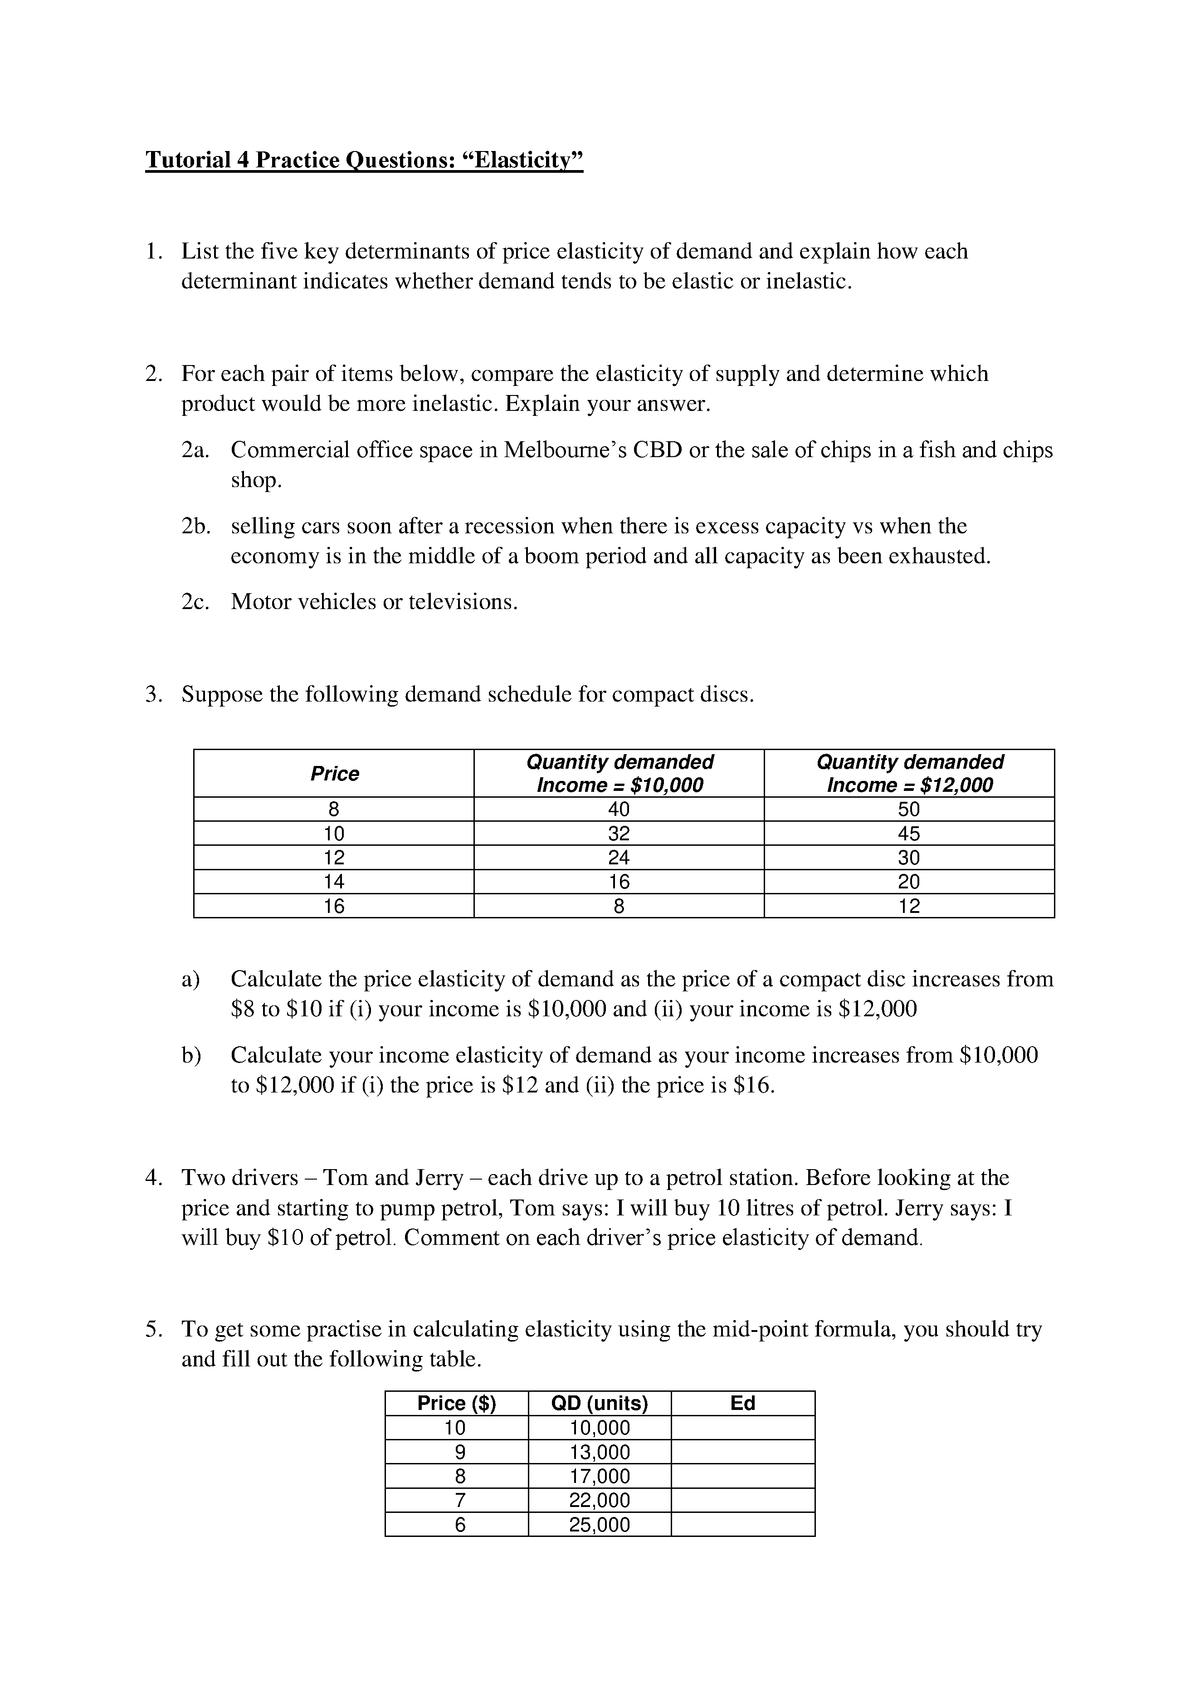 Practice Questions 4 Elasticity Eco10004 Swinburne Studocu